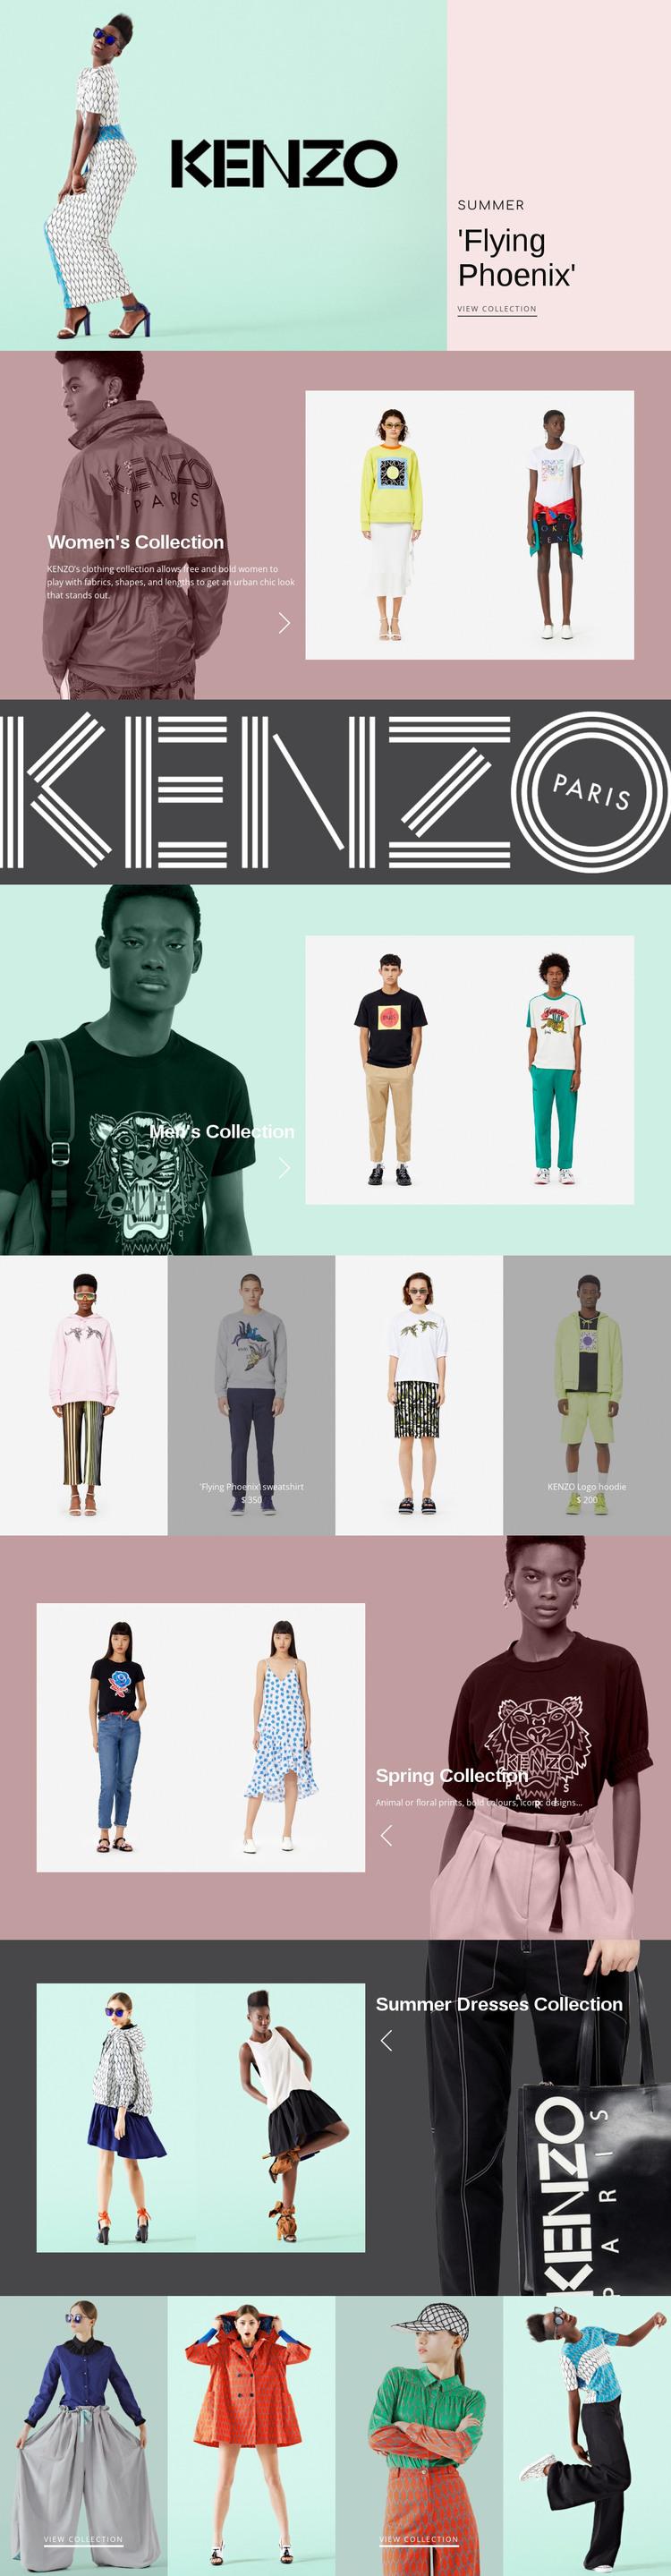 Atelier of modern fashion Web Design